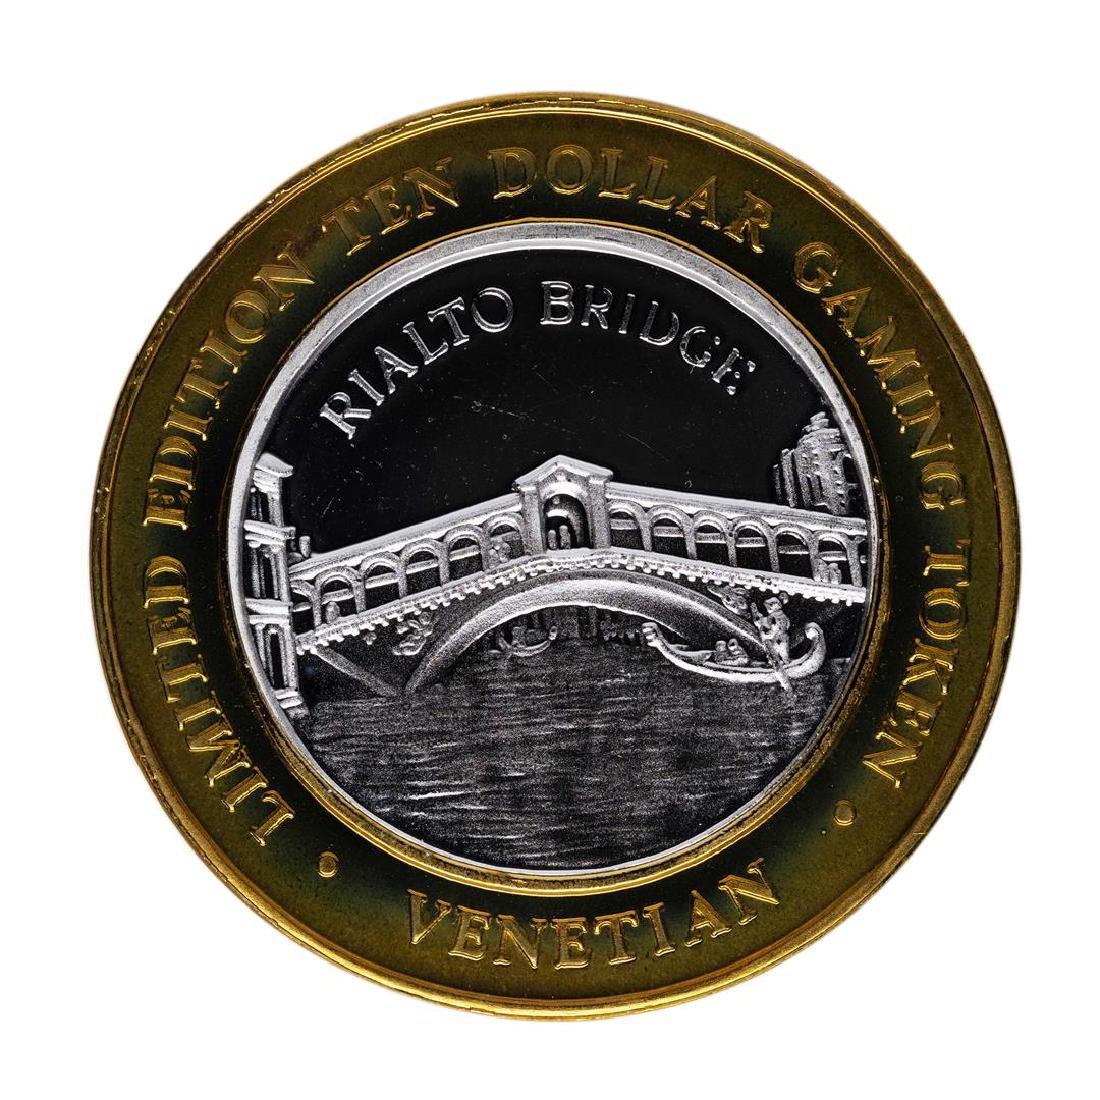 .999 Silver The Venetian Las Vegas, Nevada $10 Casino - 2